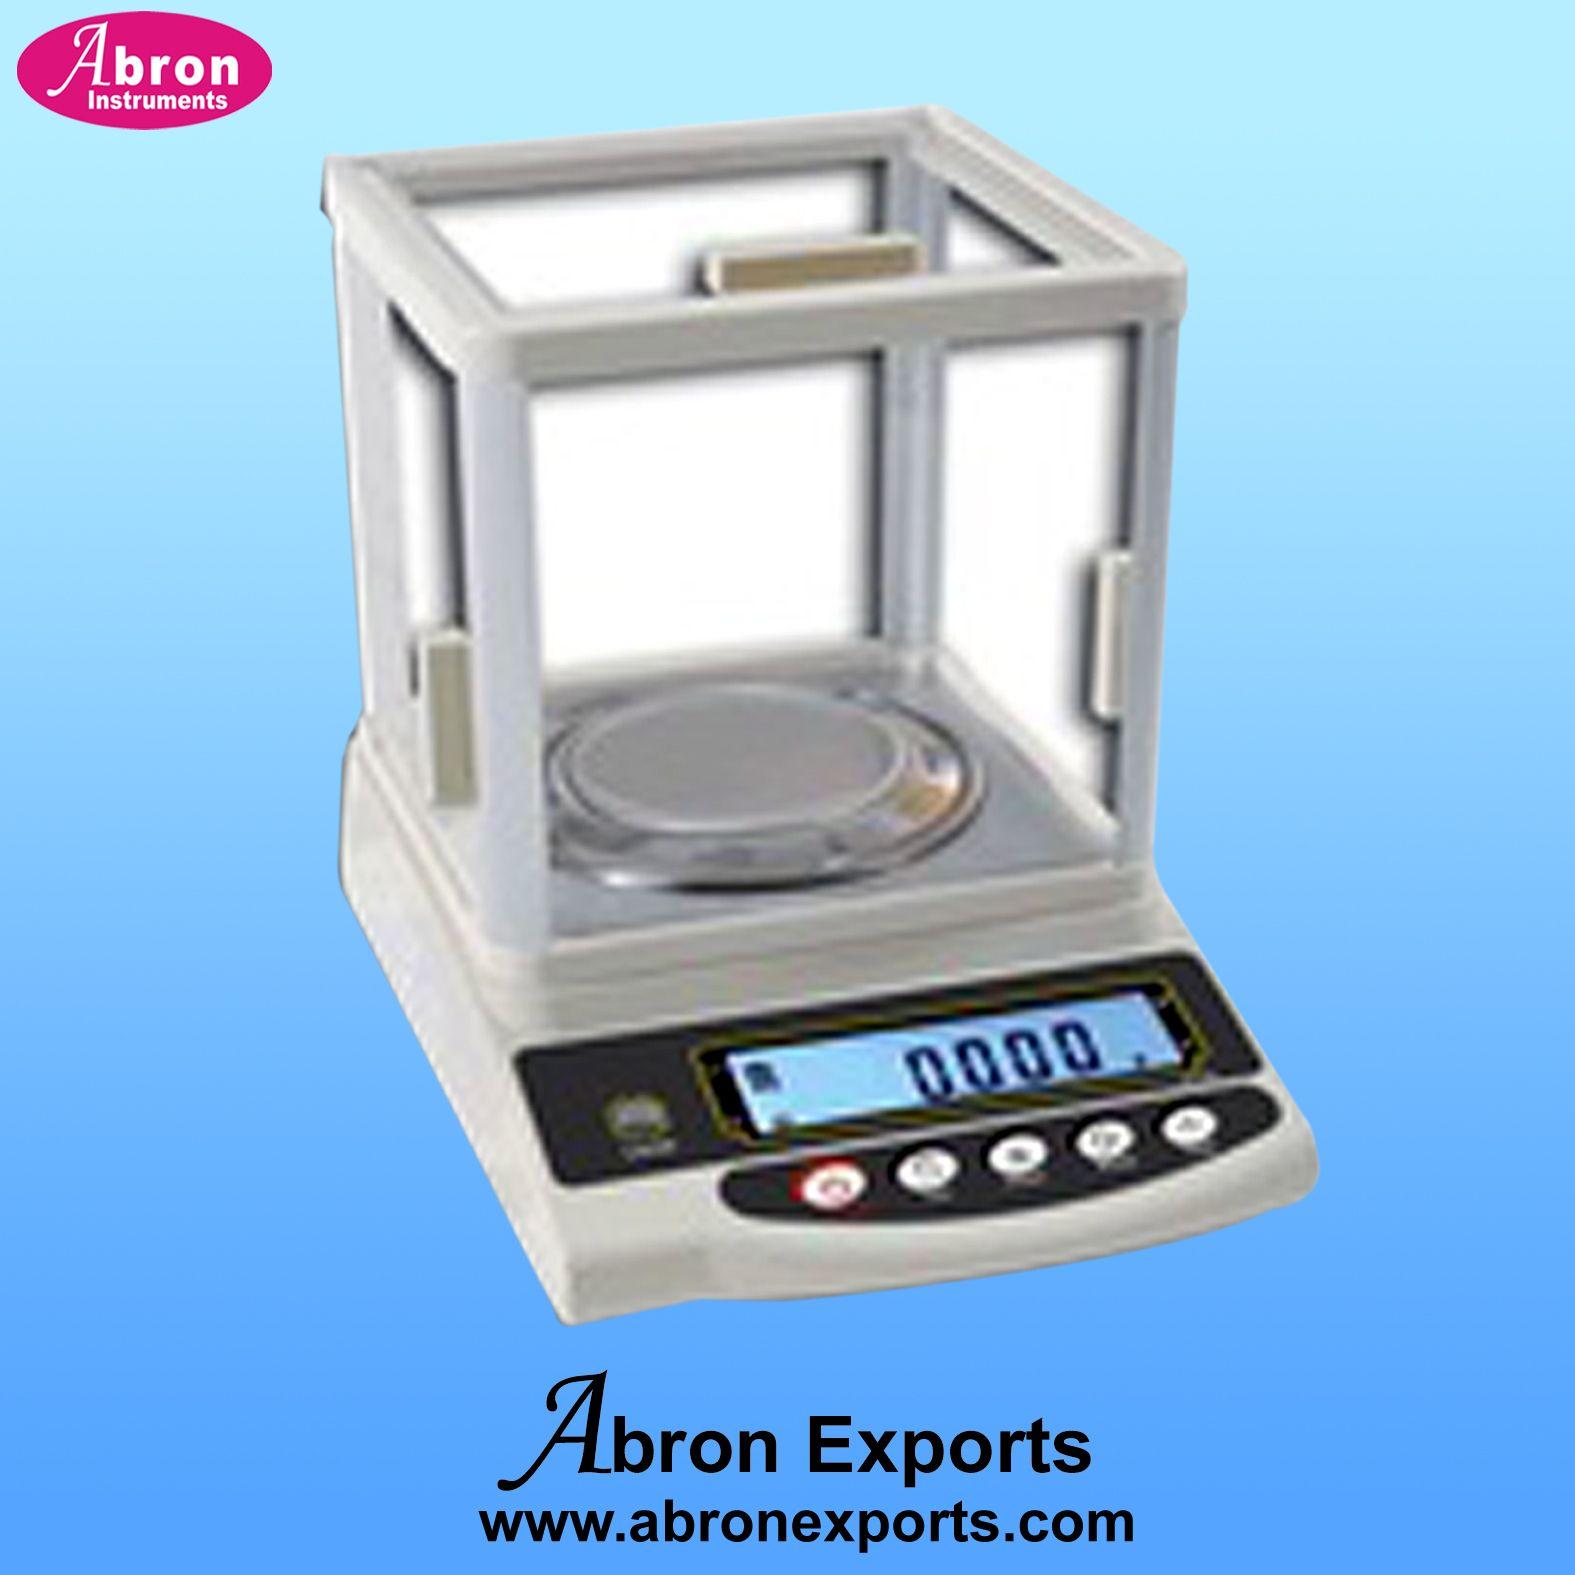 Abron Digital Balance 200gm 1mg with air shield | Abron Laboratory ... for Balance Laboratory Apparatus  155sfw